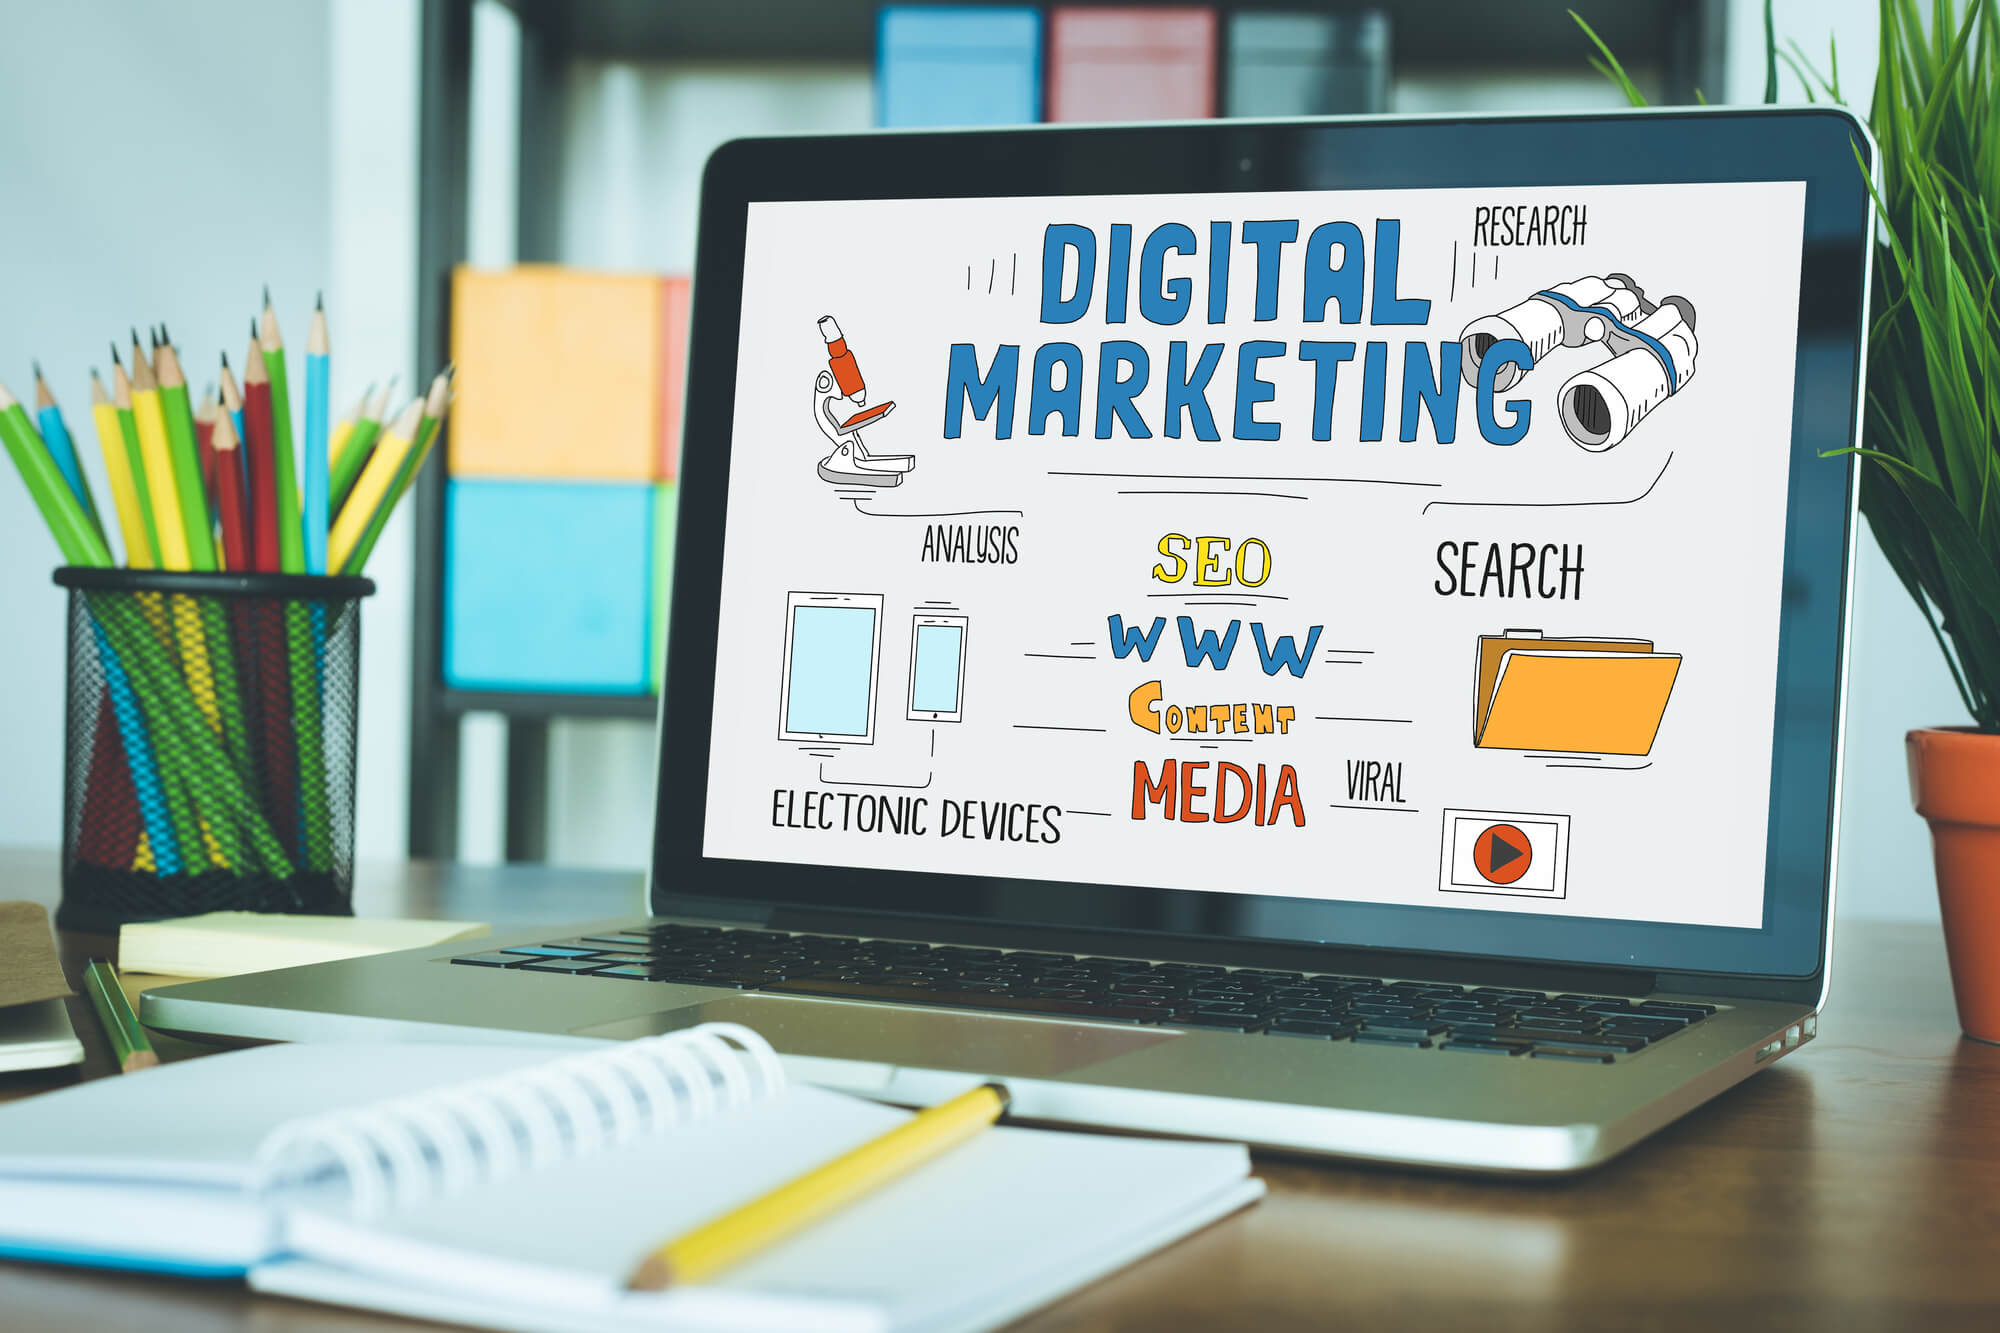 digital-marketing-concept